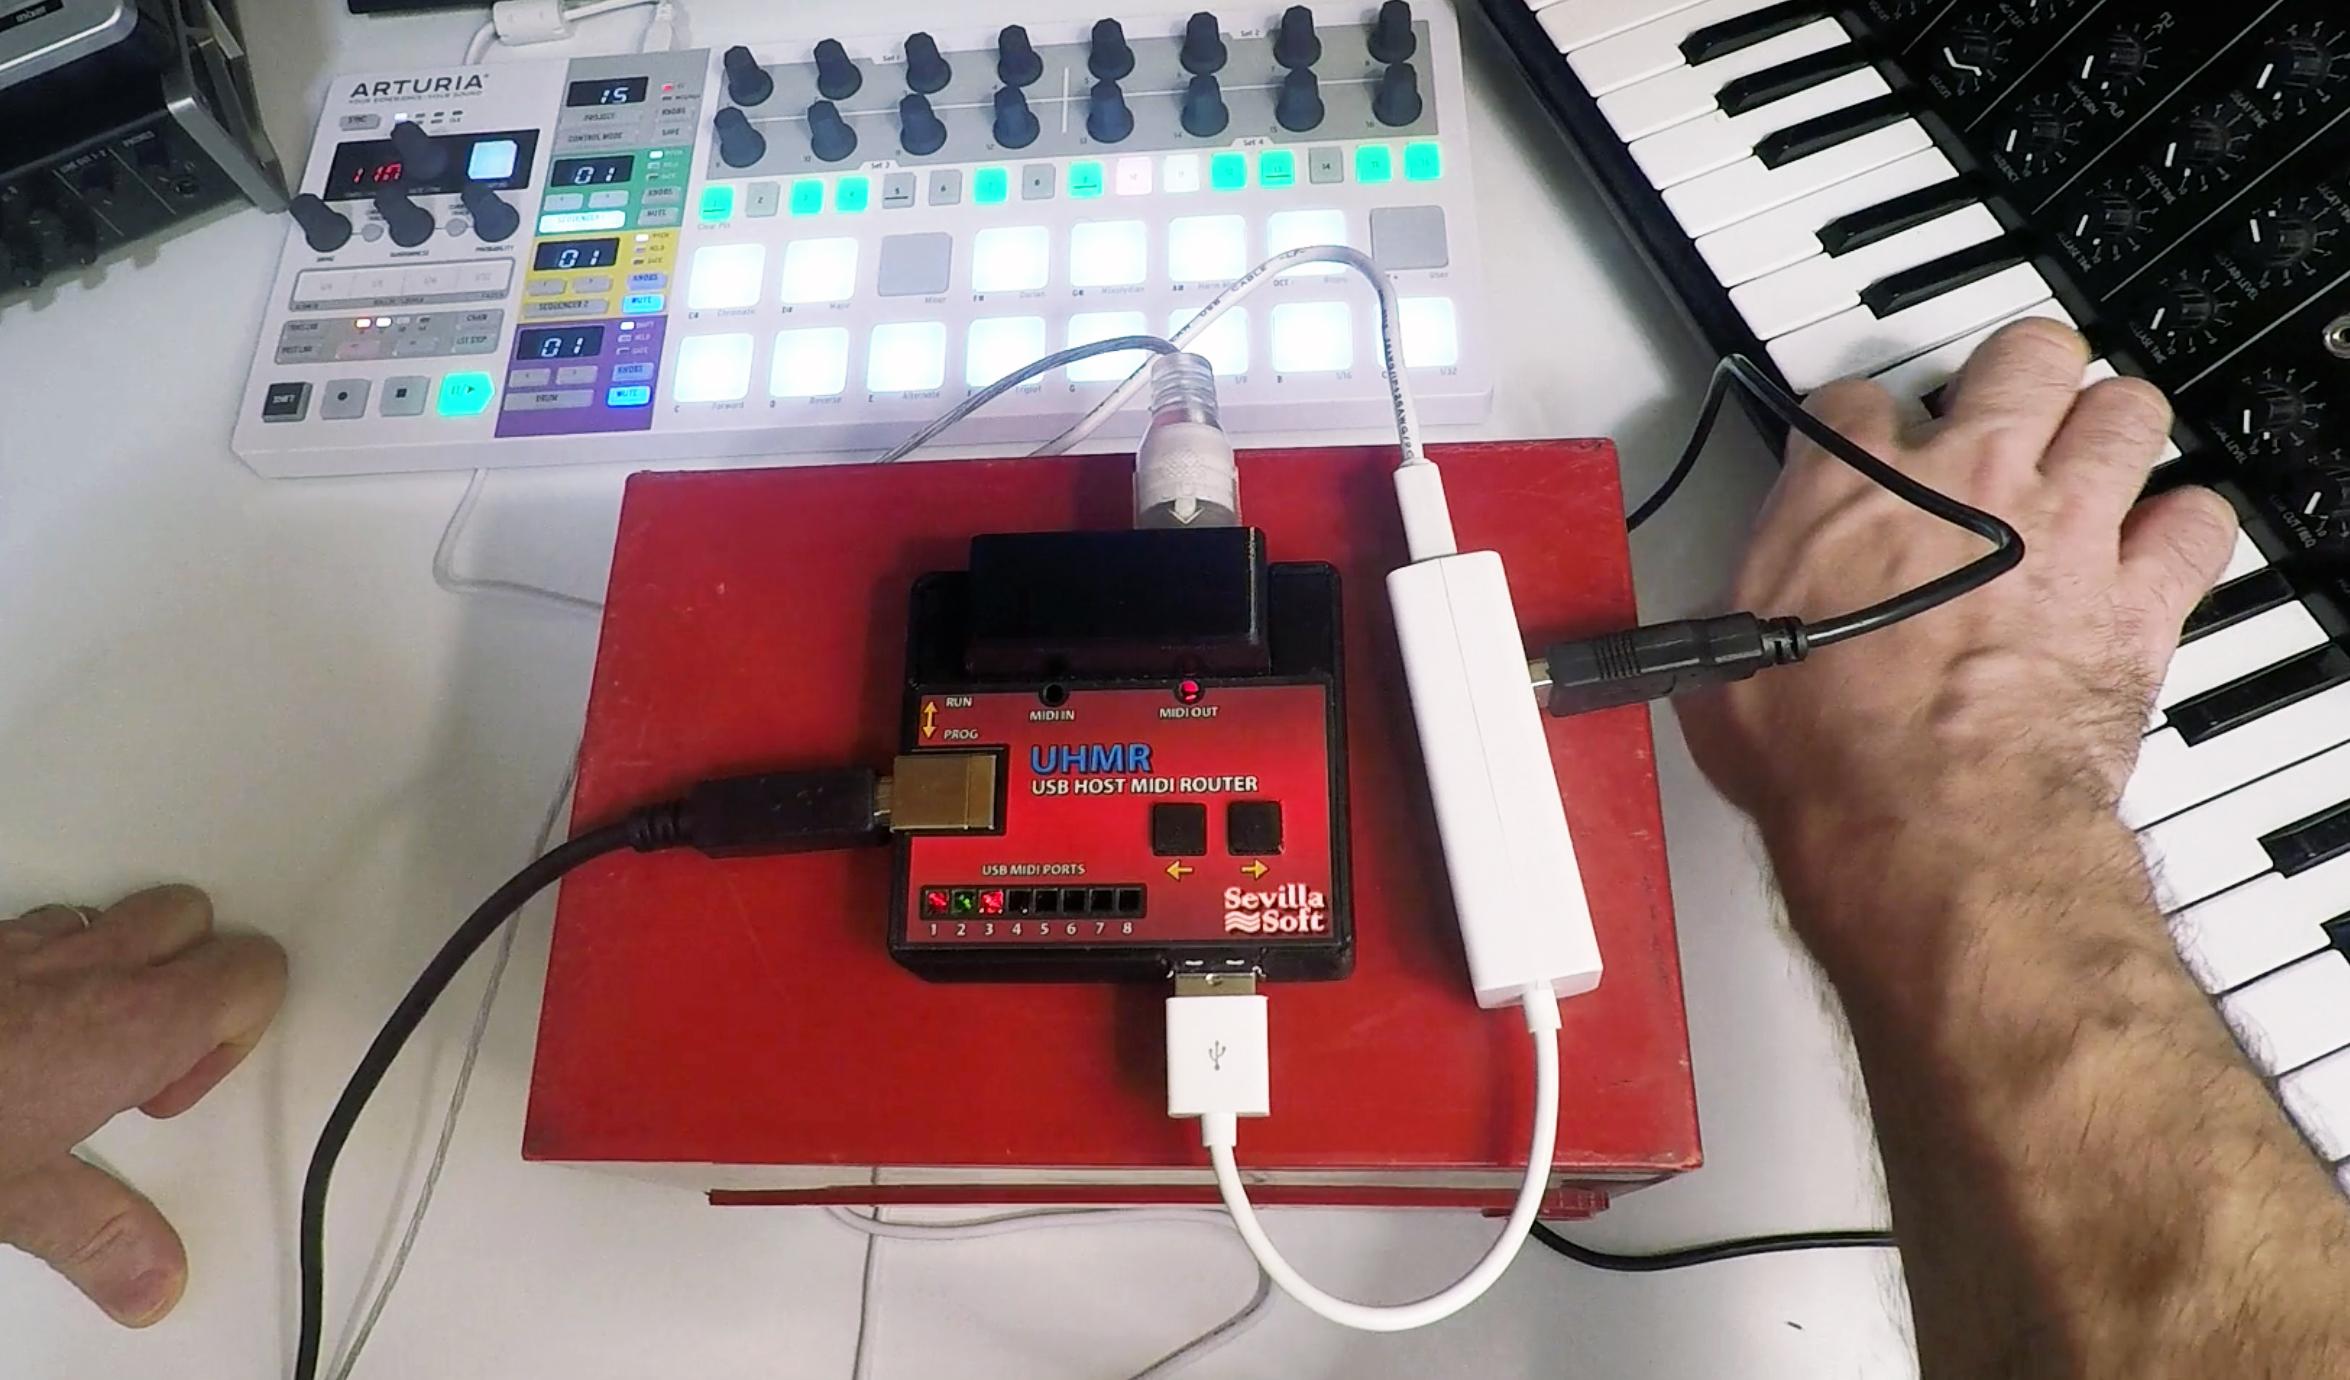 Review de USB Host MIDI Router (UHMR), el patchbay MIDI